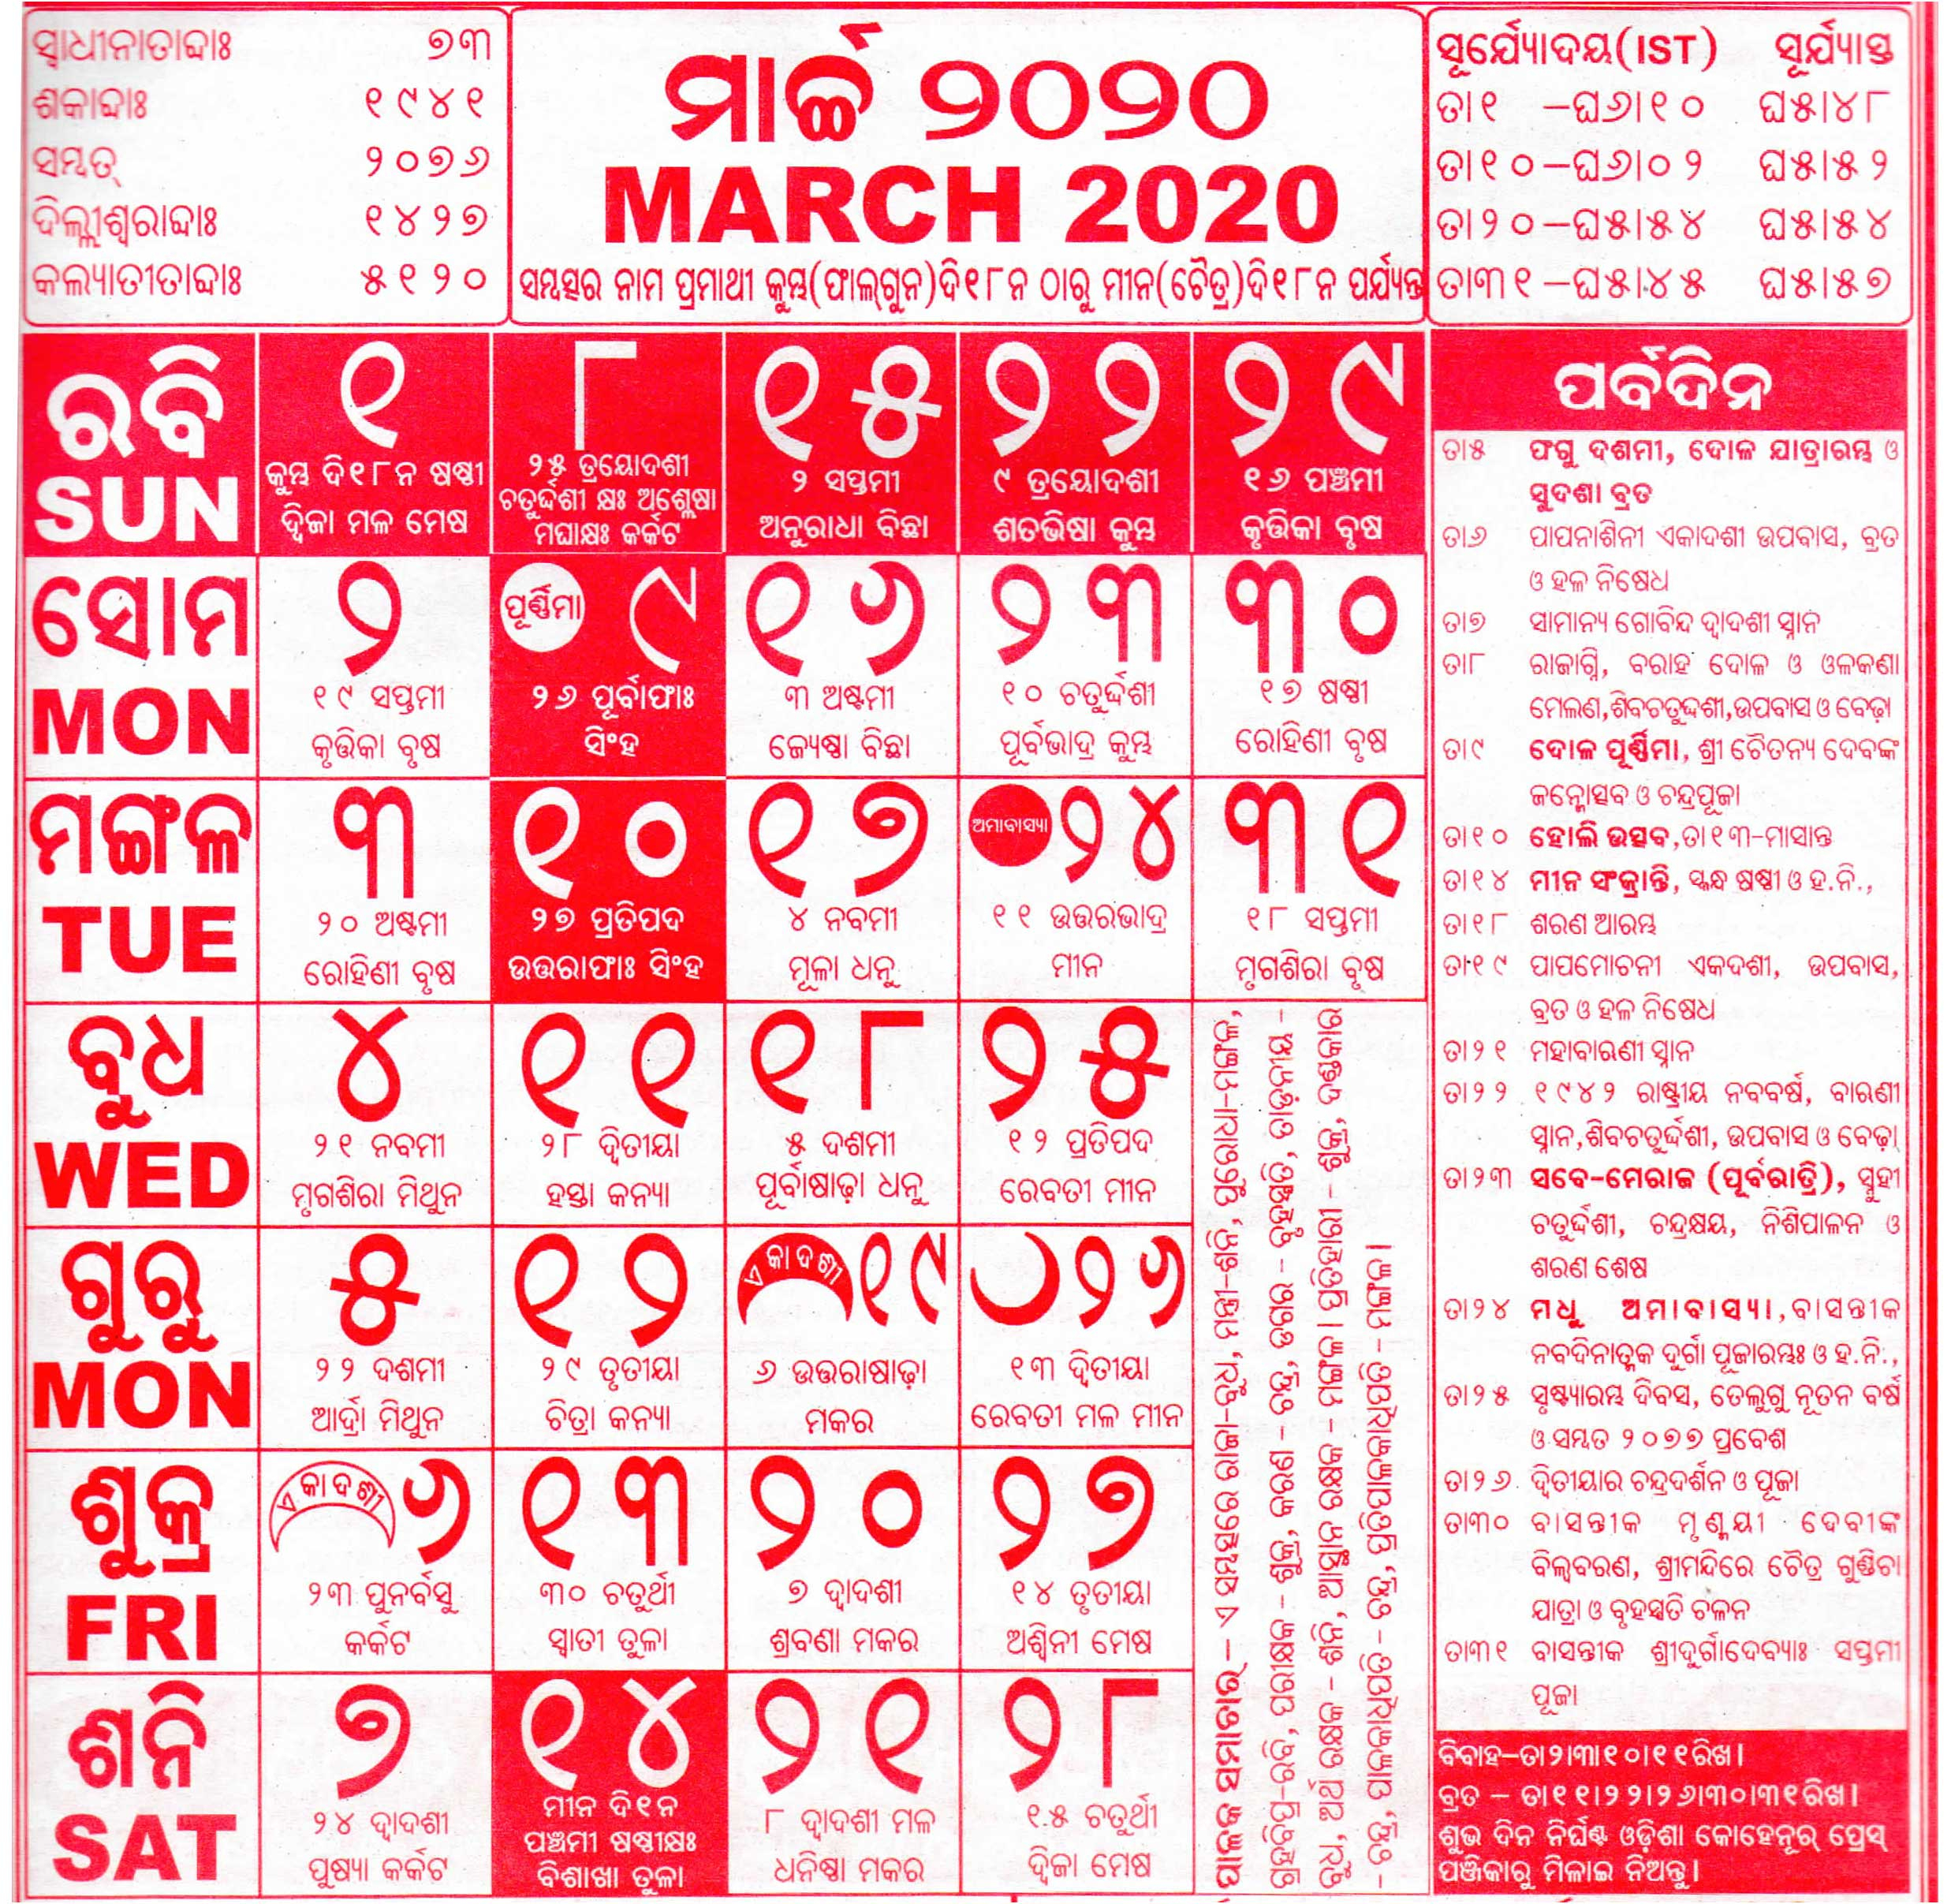 Odia Calendar March 2020 | | Calendarcraft with regard to Oriya Calendar 2020 February